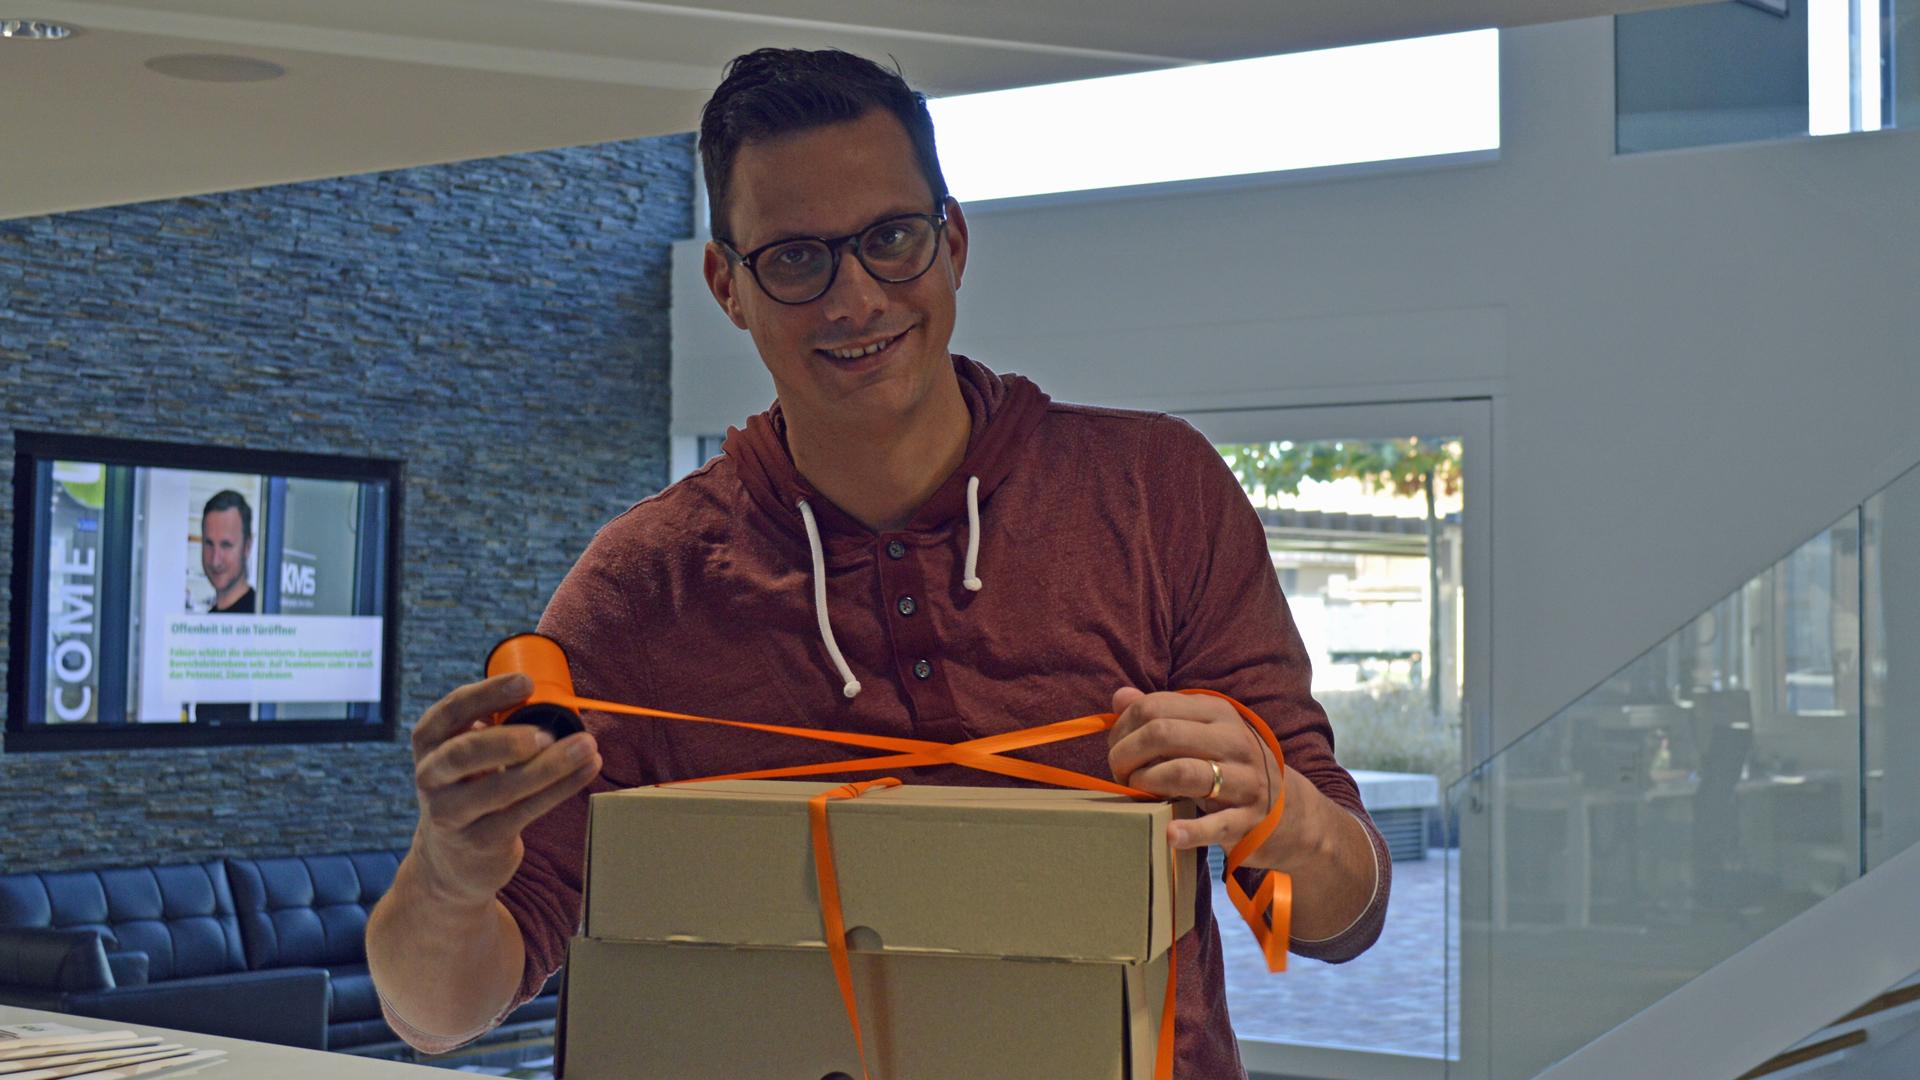 Florian Bastadin schnürt Paket